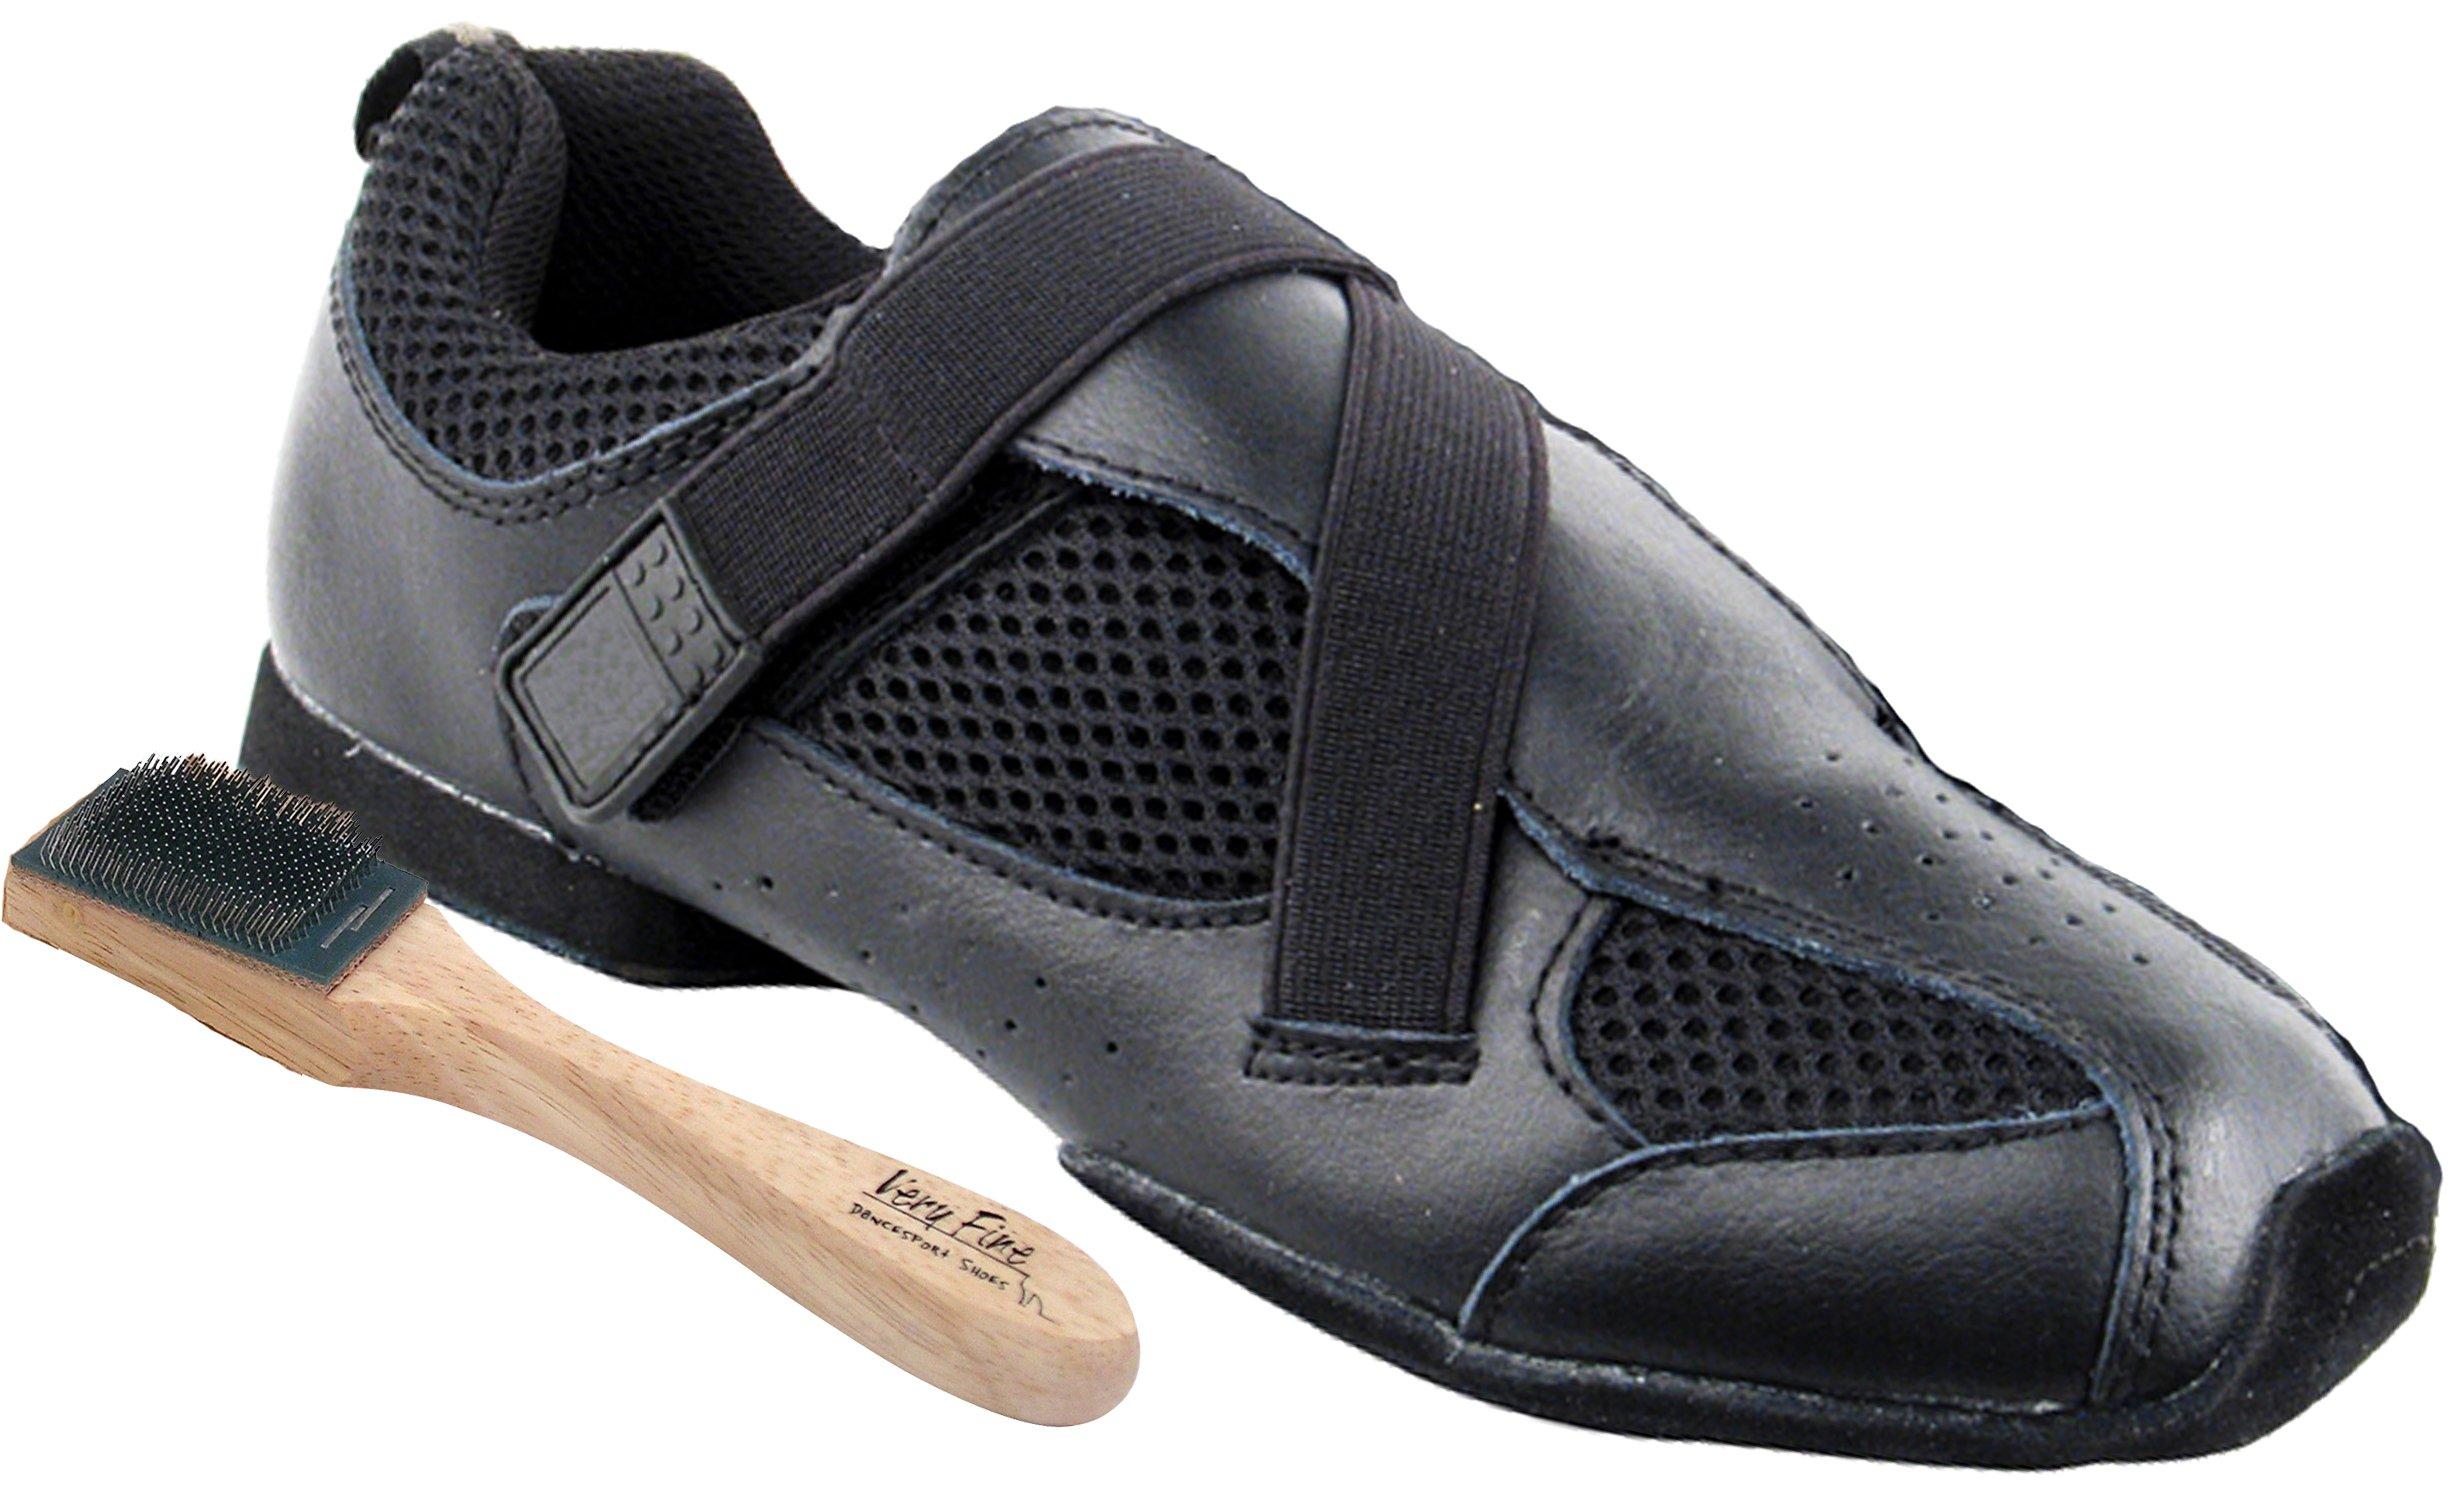 Very Fine Men's Women's Salsa Ballroom Latin Zumba Hip Hop Dance Sneakers Style VFSN009 Bundle with Dance Shoe Wire Brush, Black 12 M US (US Women 12/ US Men 10.5) by Very Fine Dance Shoes (Image #1)